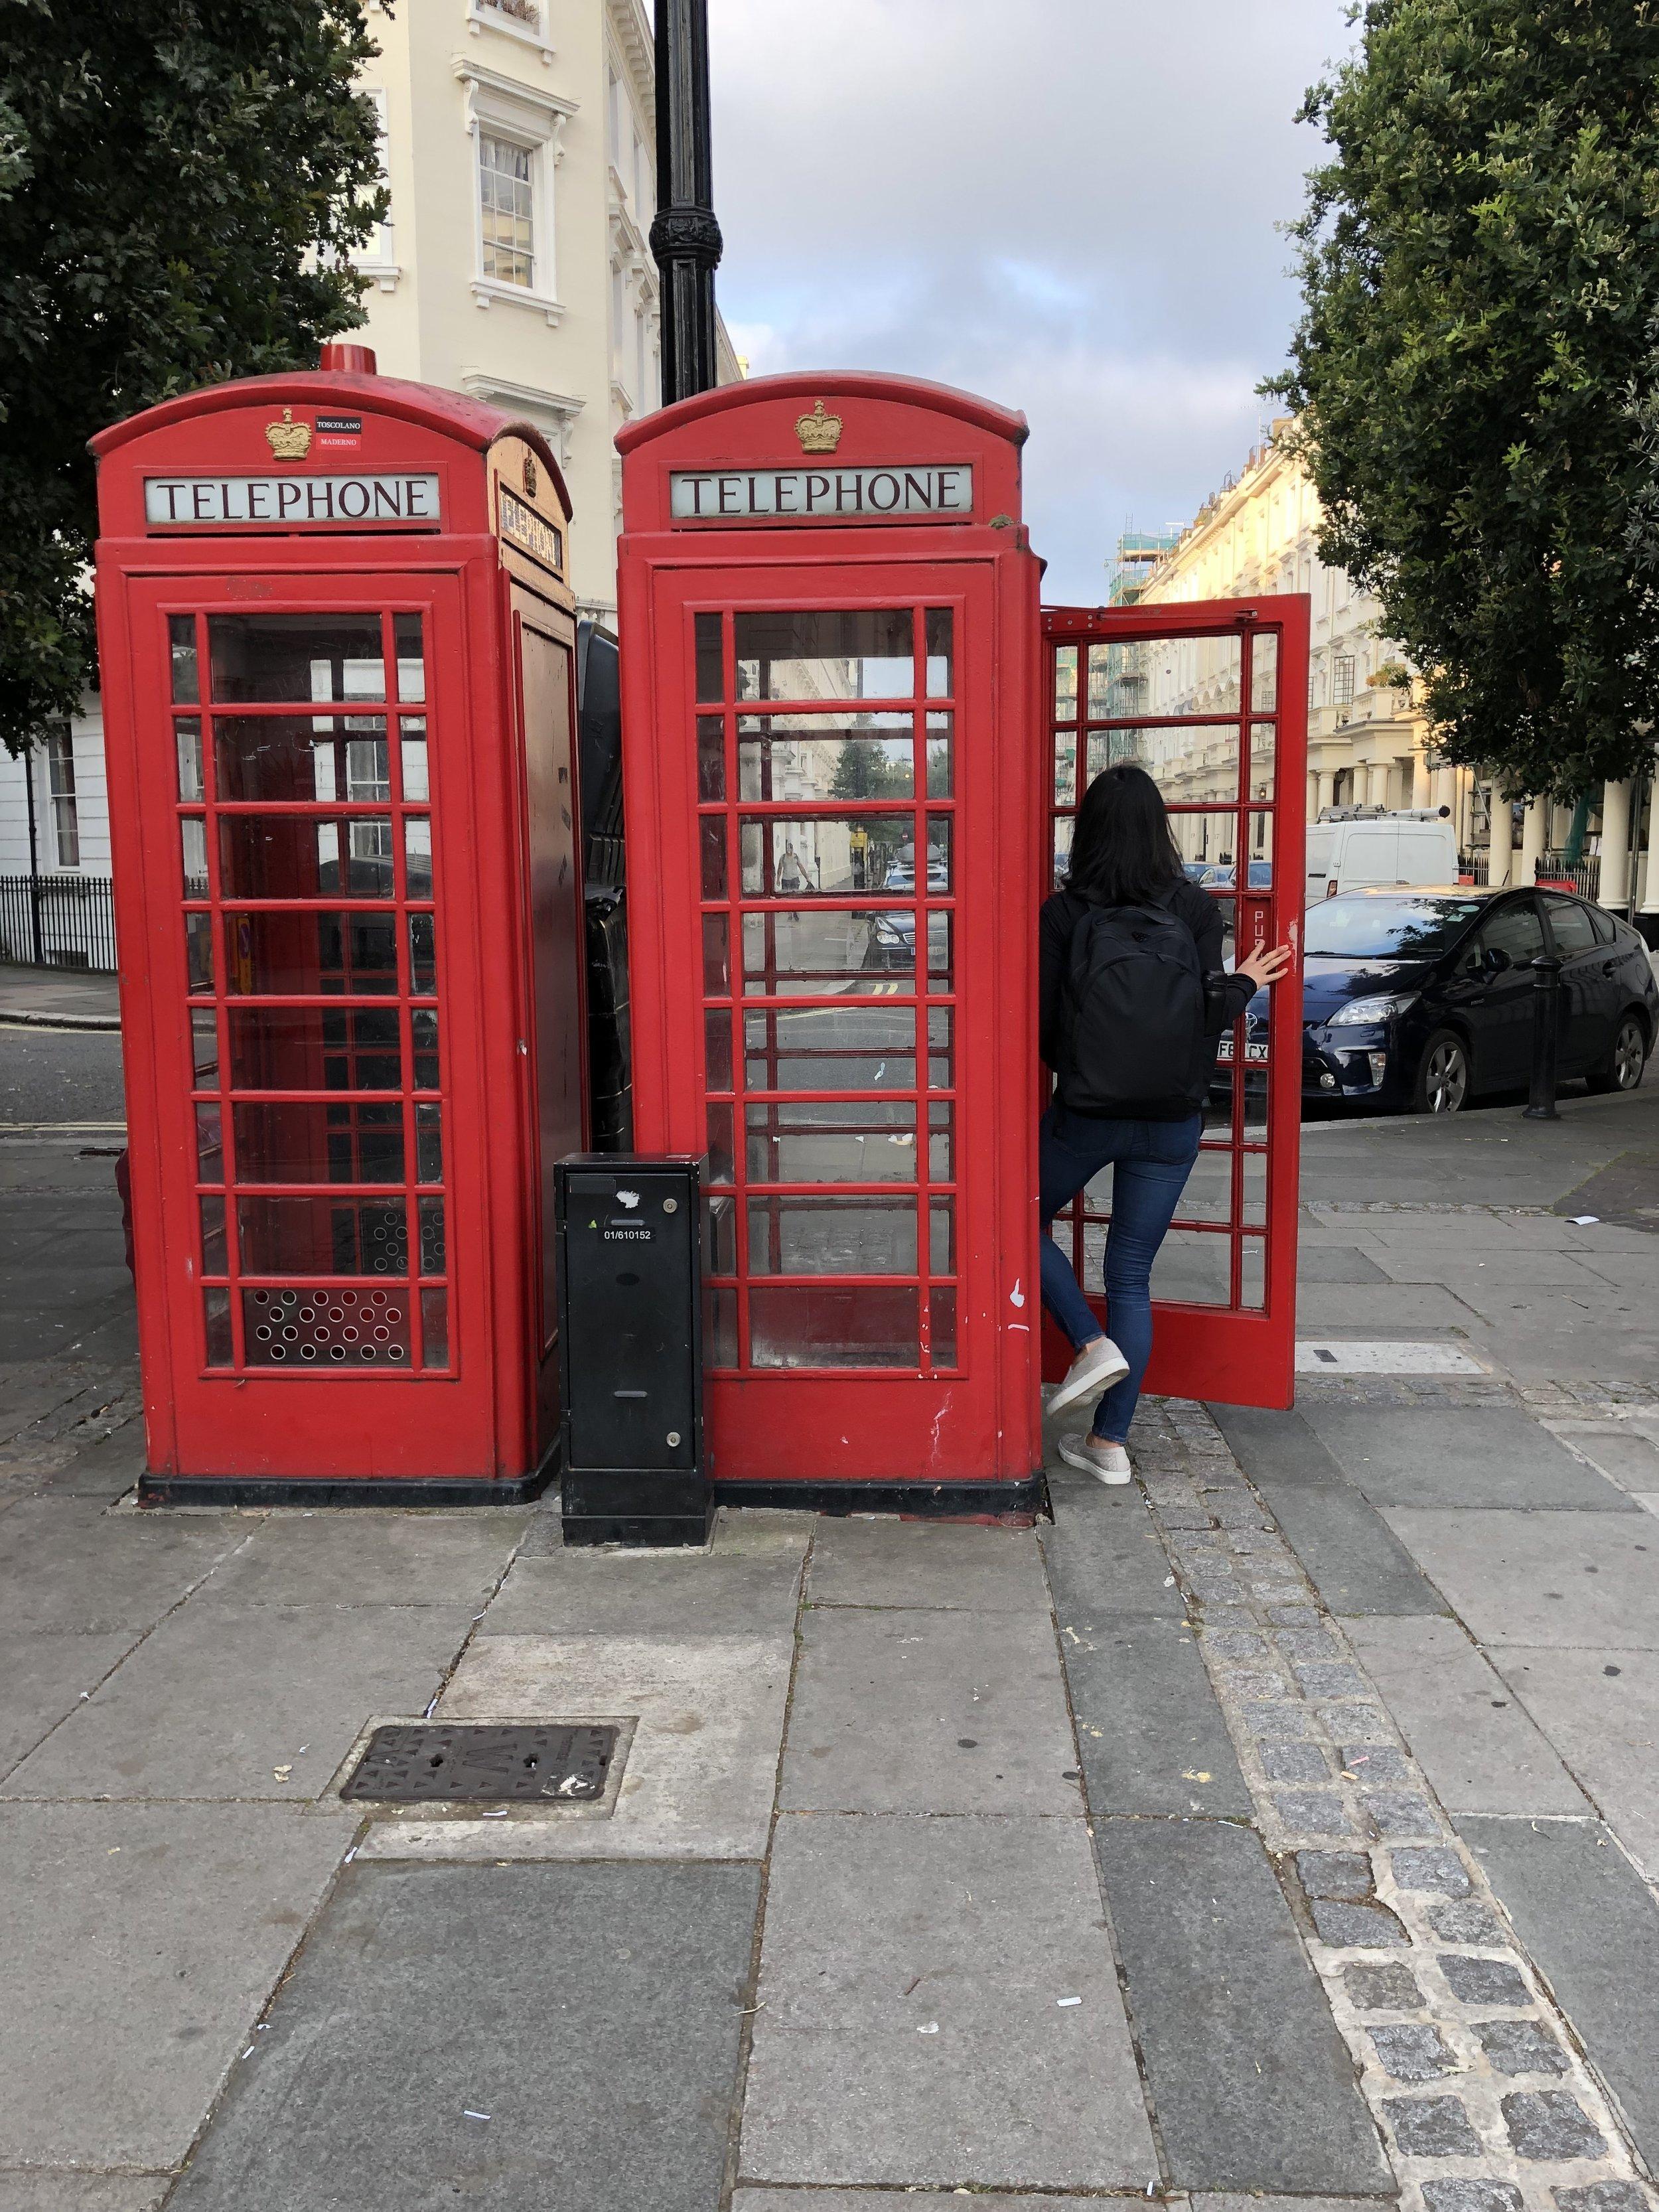 LondonPhoneBooth.JPG